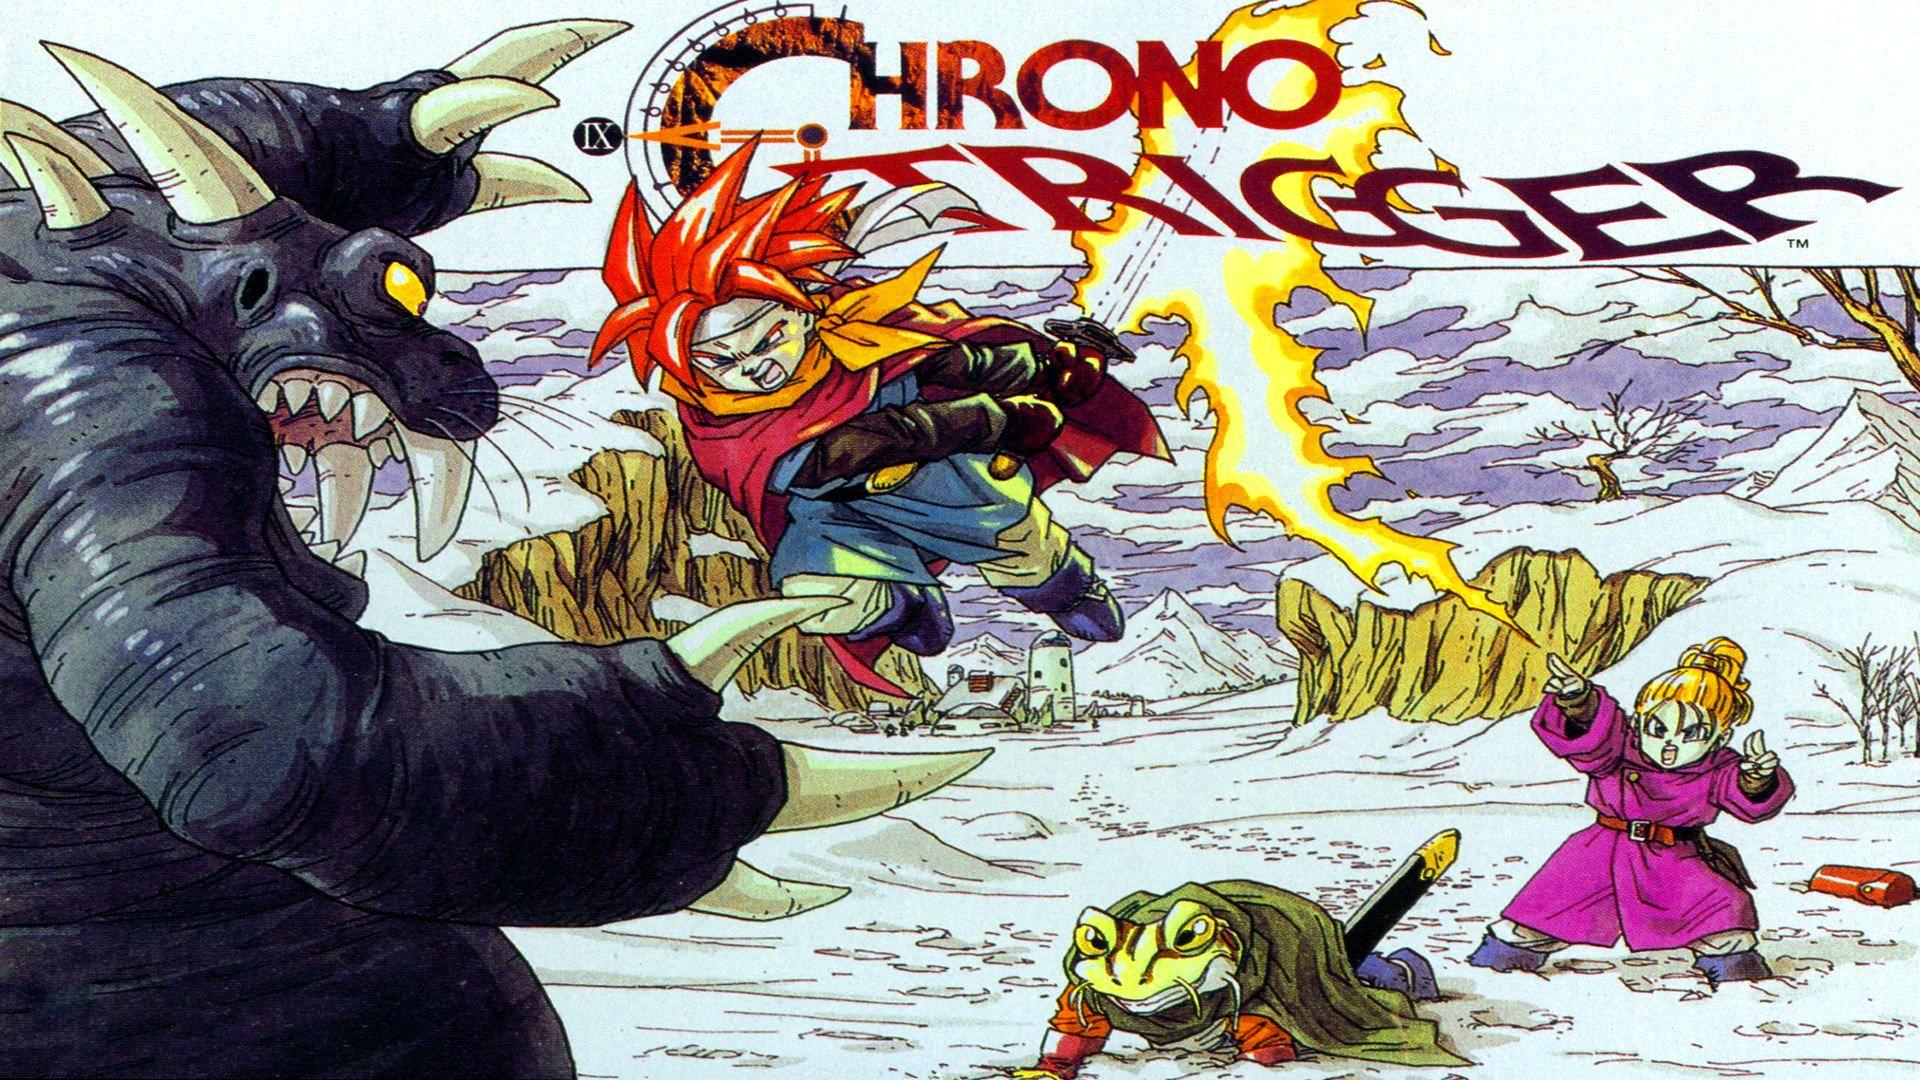 Chrono Trigger HD Wallpaper | Background Image | 1920x1080 ...